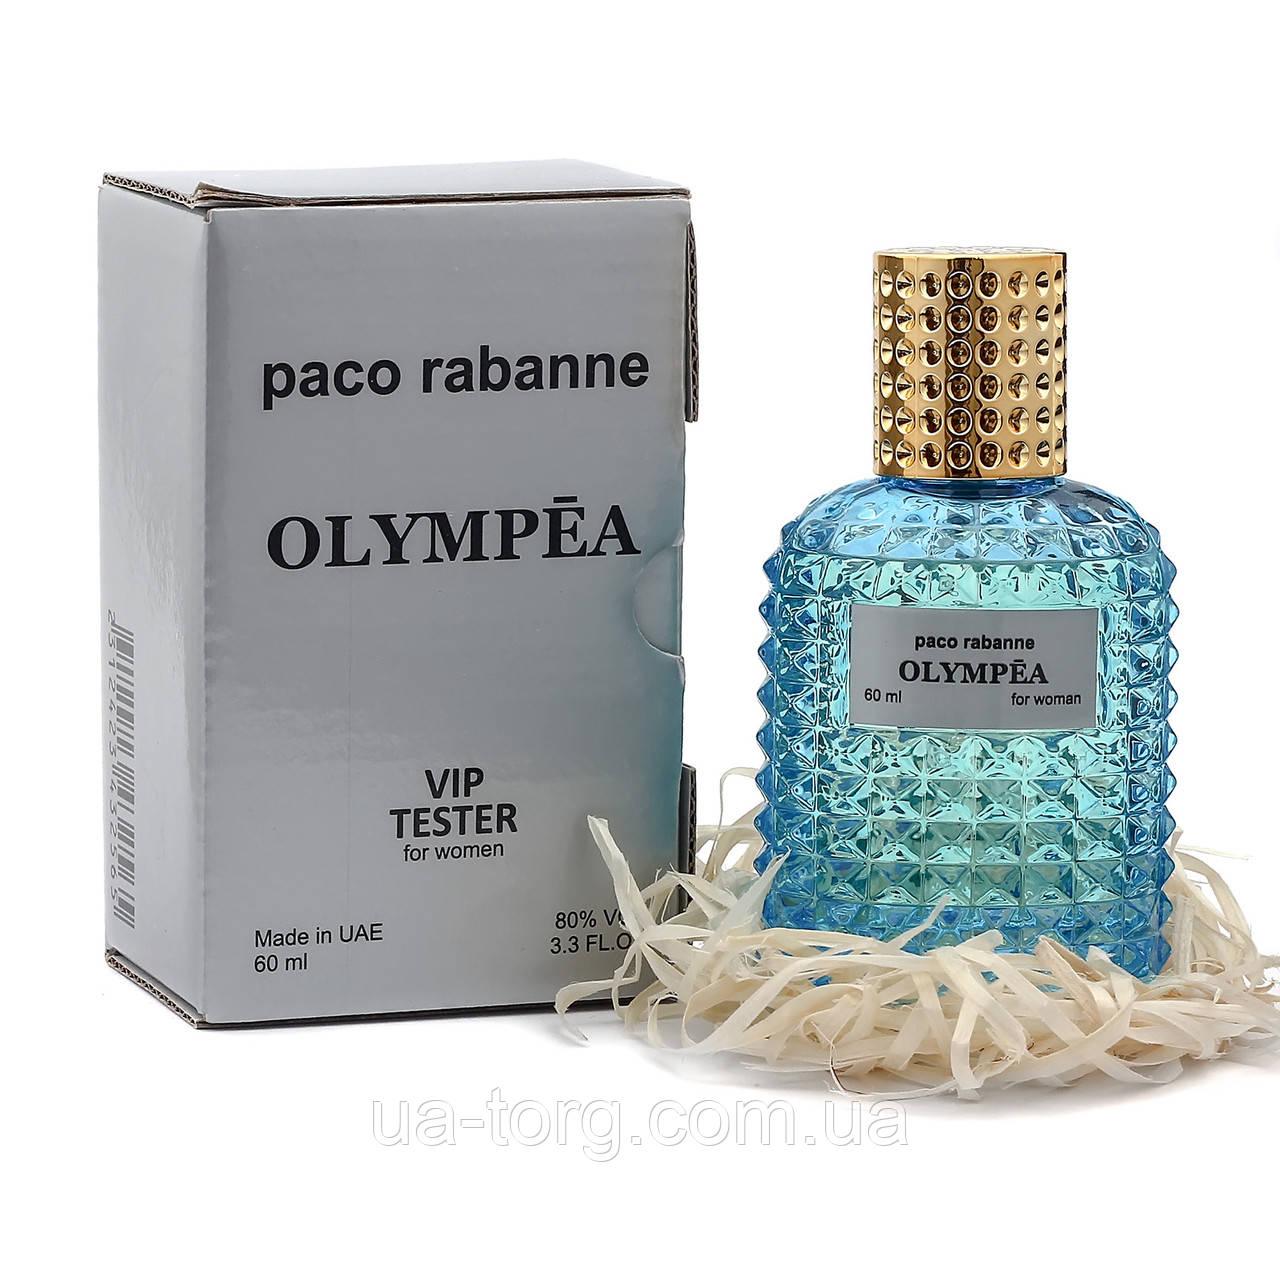 Paco Rabanne Olympea TESTER VIP, женский, 60 мл